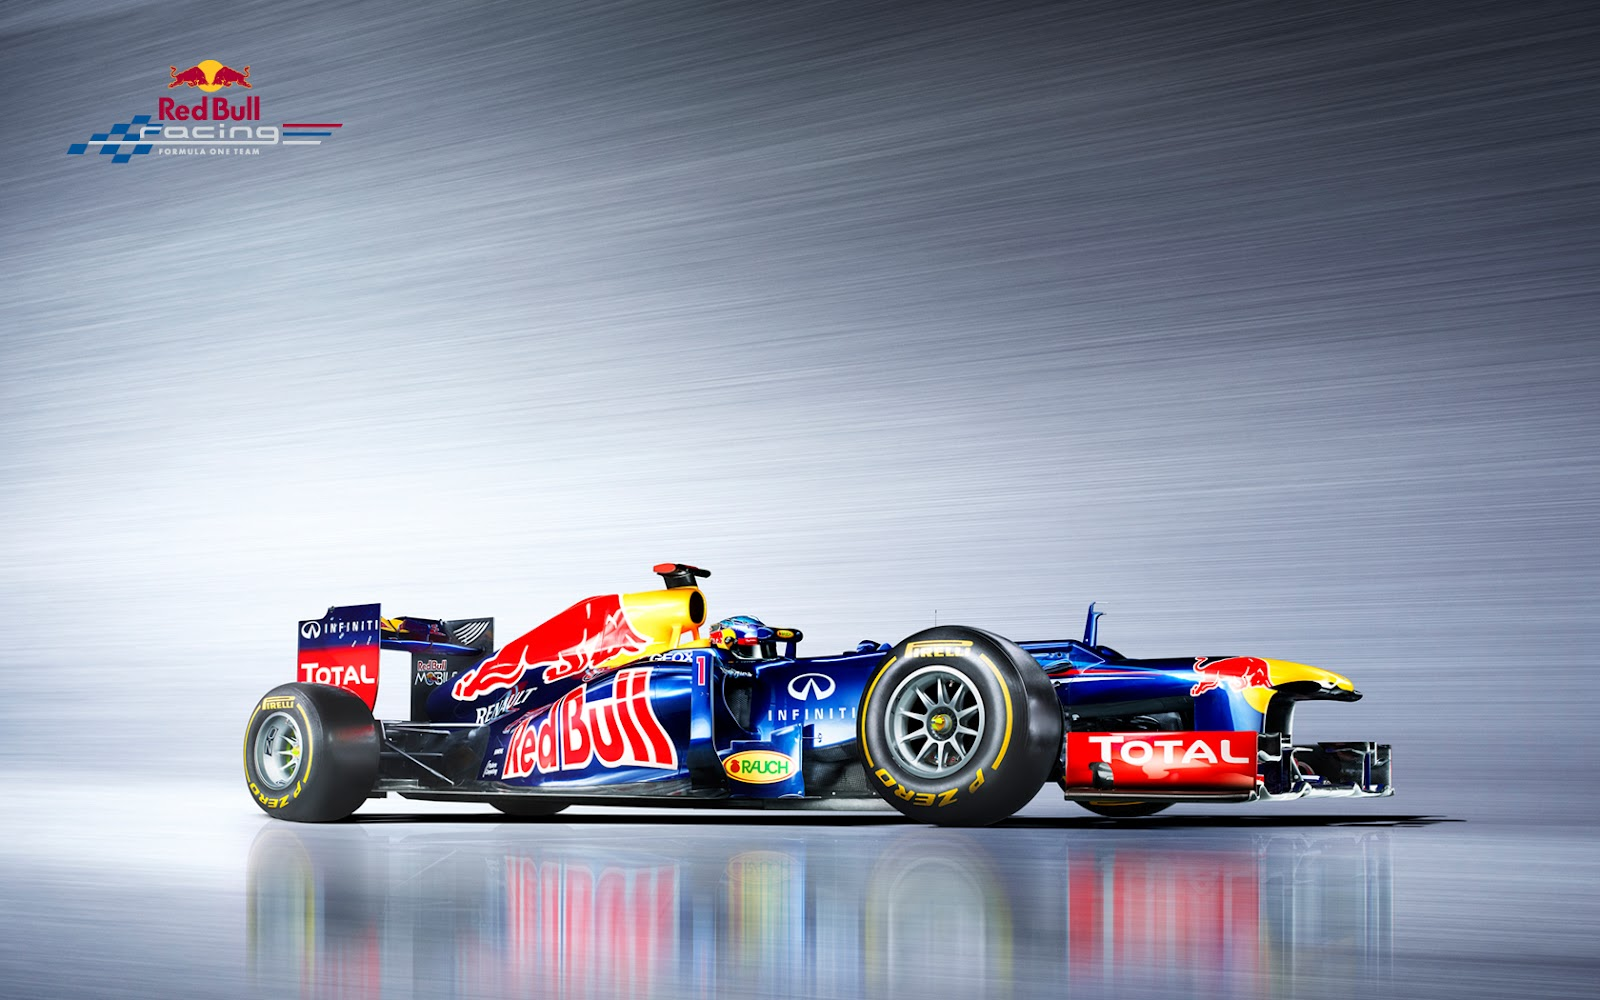 Red Bull Racing F1 Team RB8 2012 Wallpaper - KFZoom